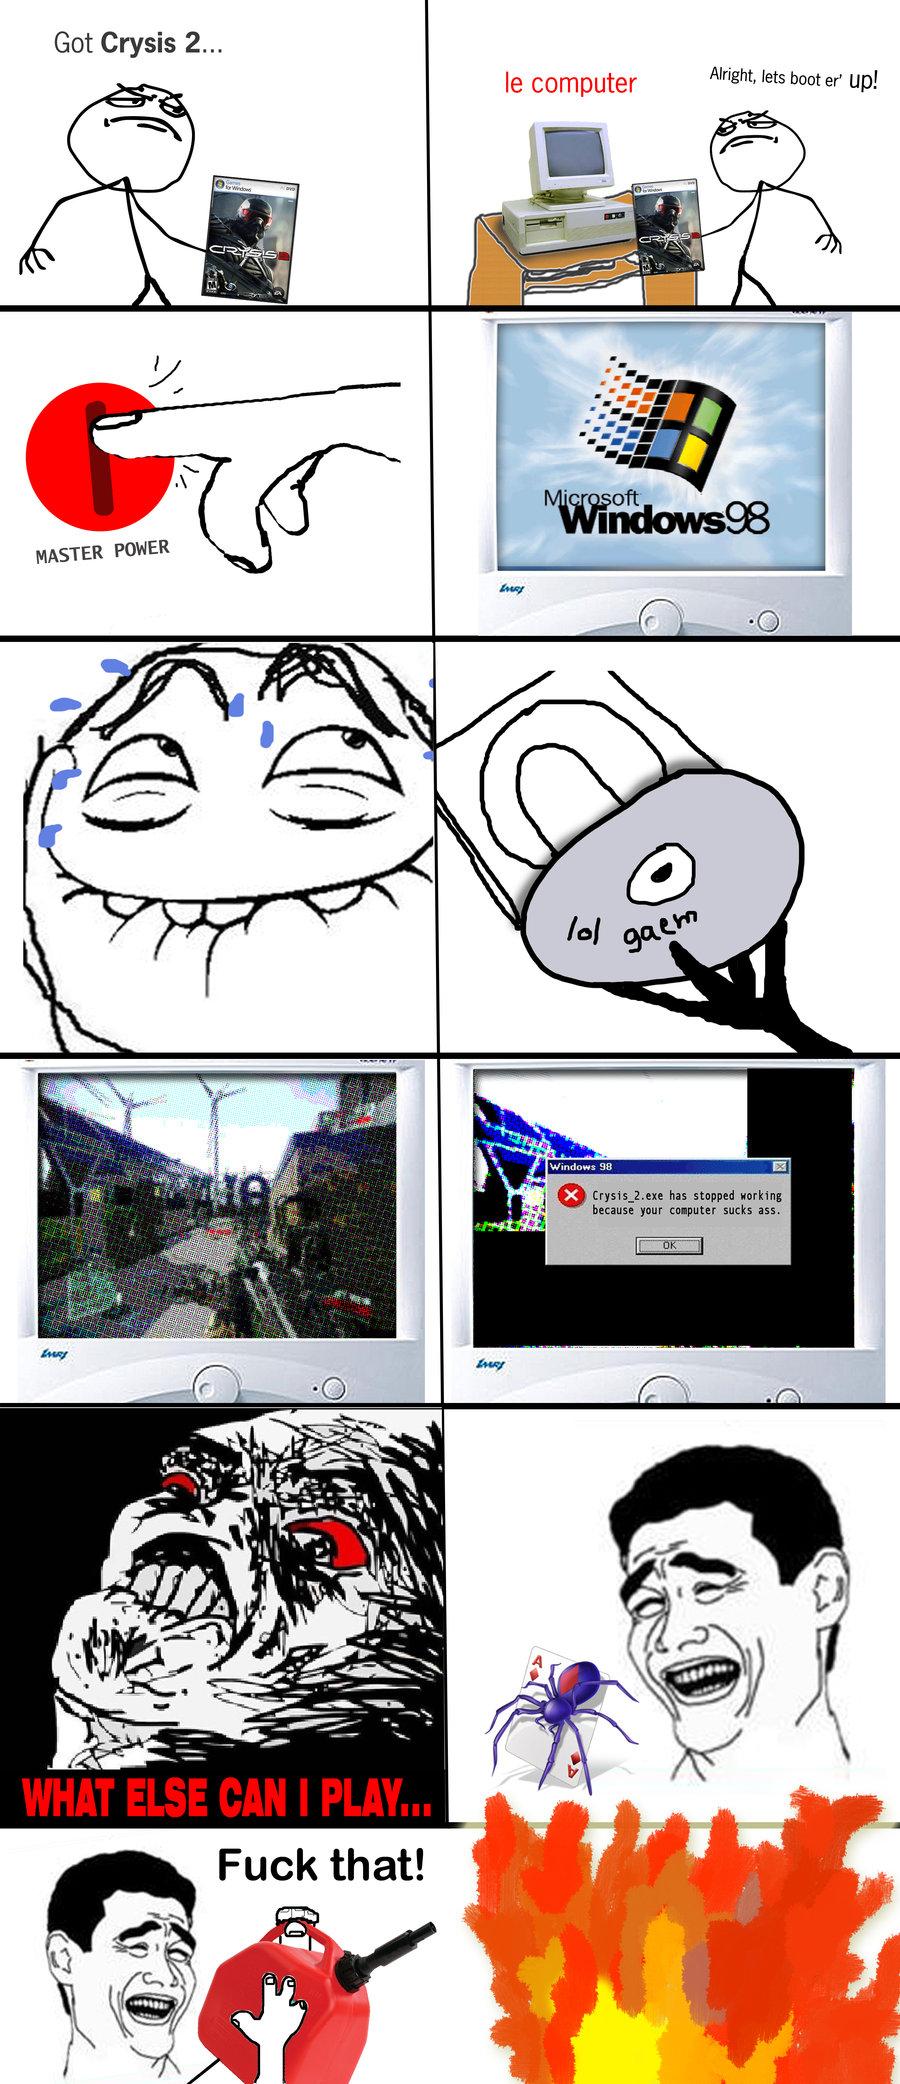 yao ming meme comics - photo #19